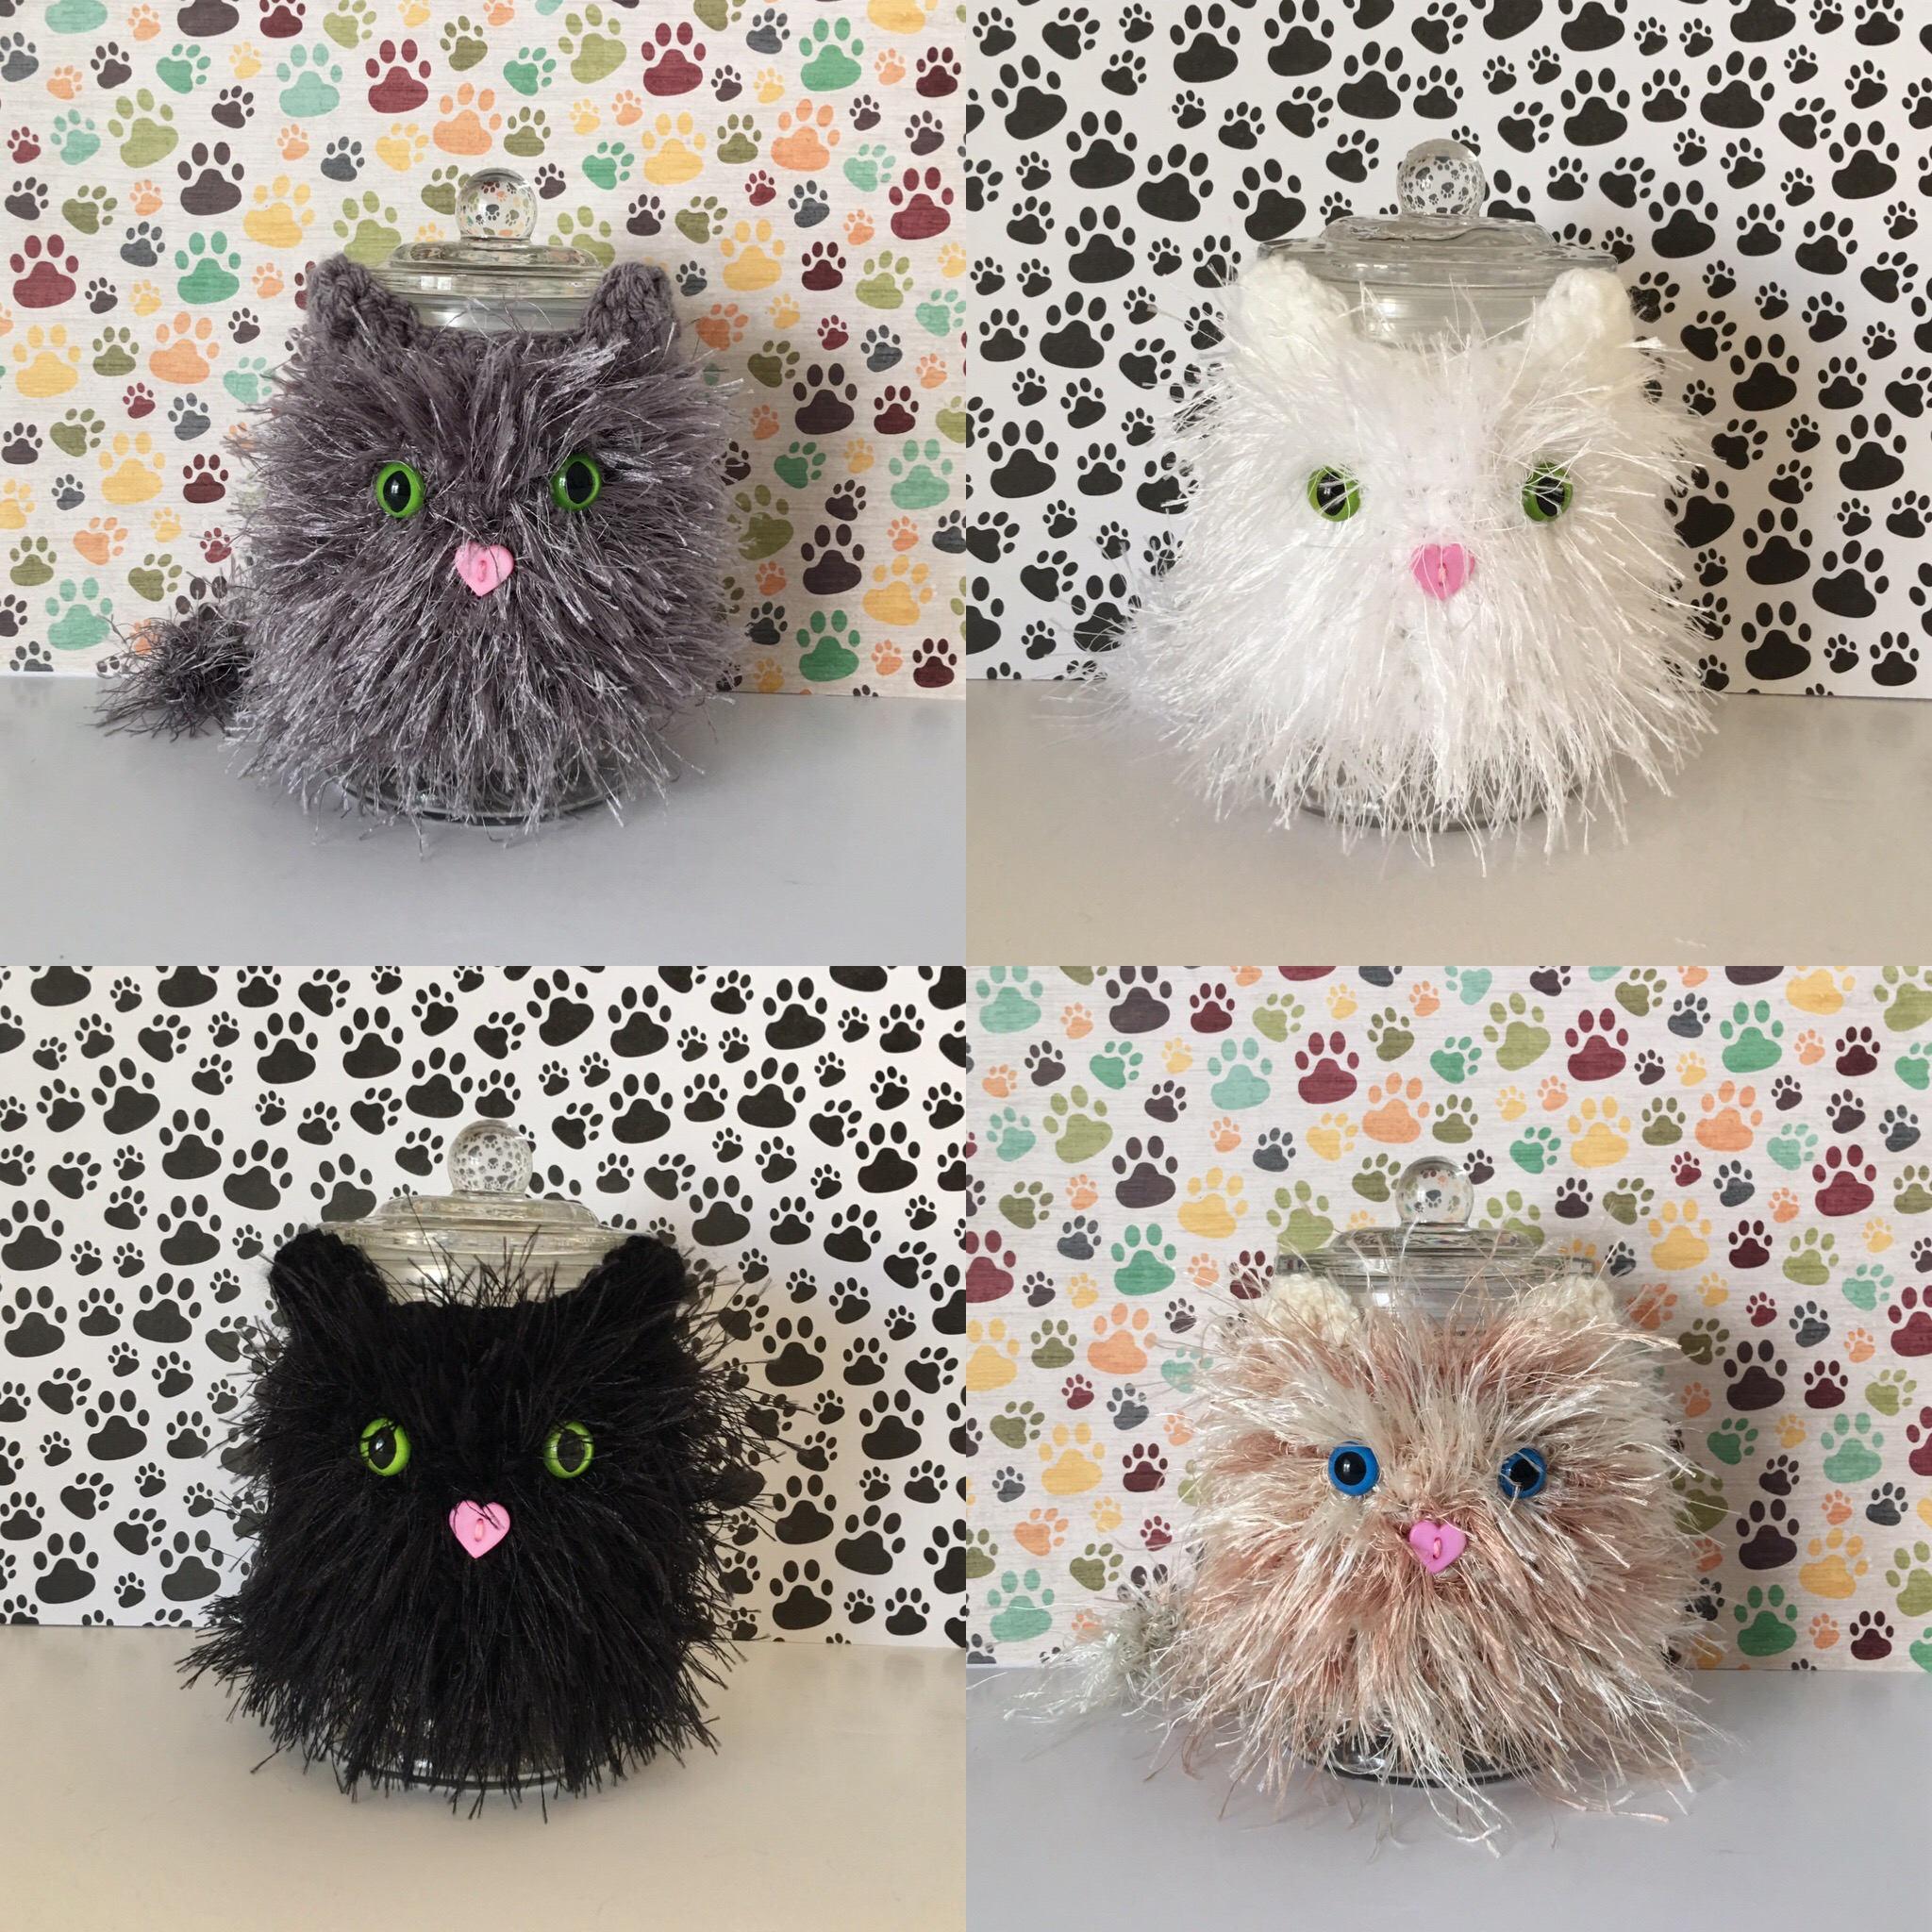 Amigurumi Beginner Kit : Crochet Cat Pattern - Cat Crochet Pattern, Crochet Kits ...